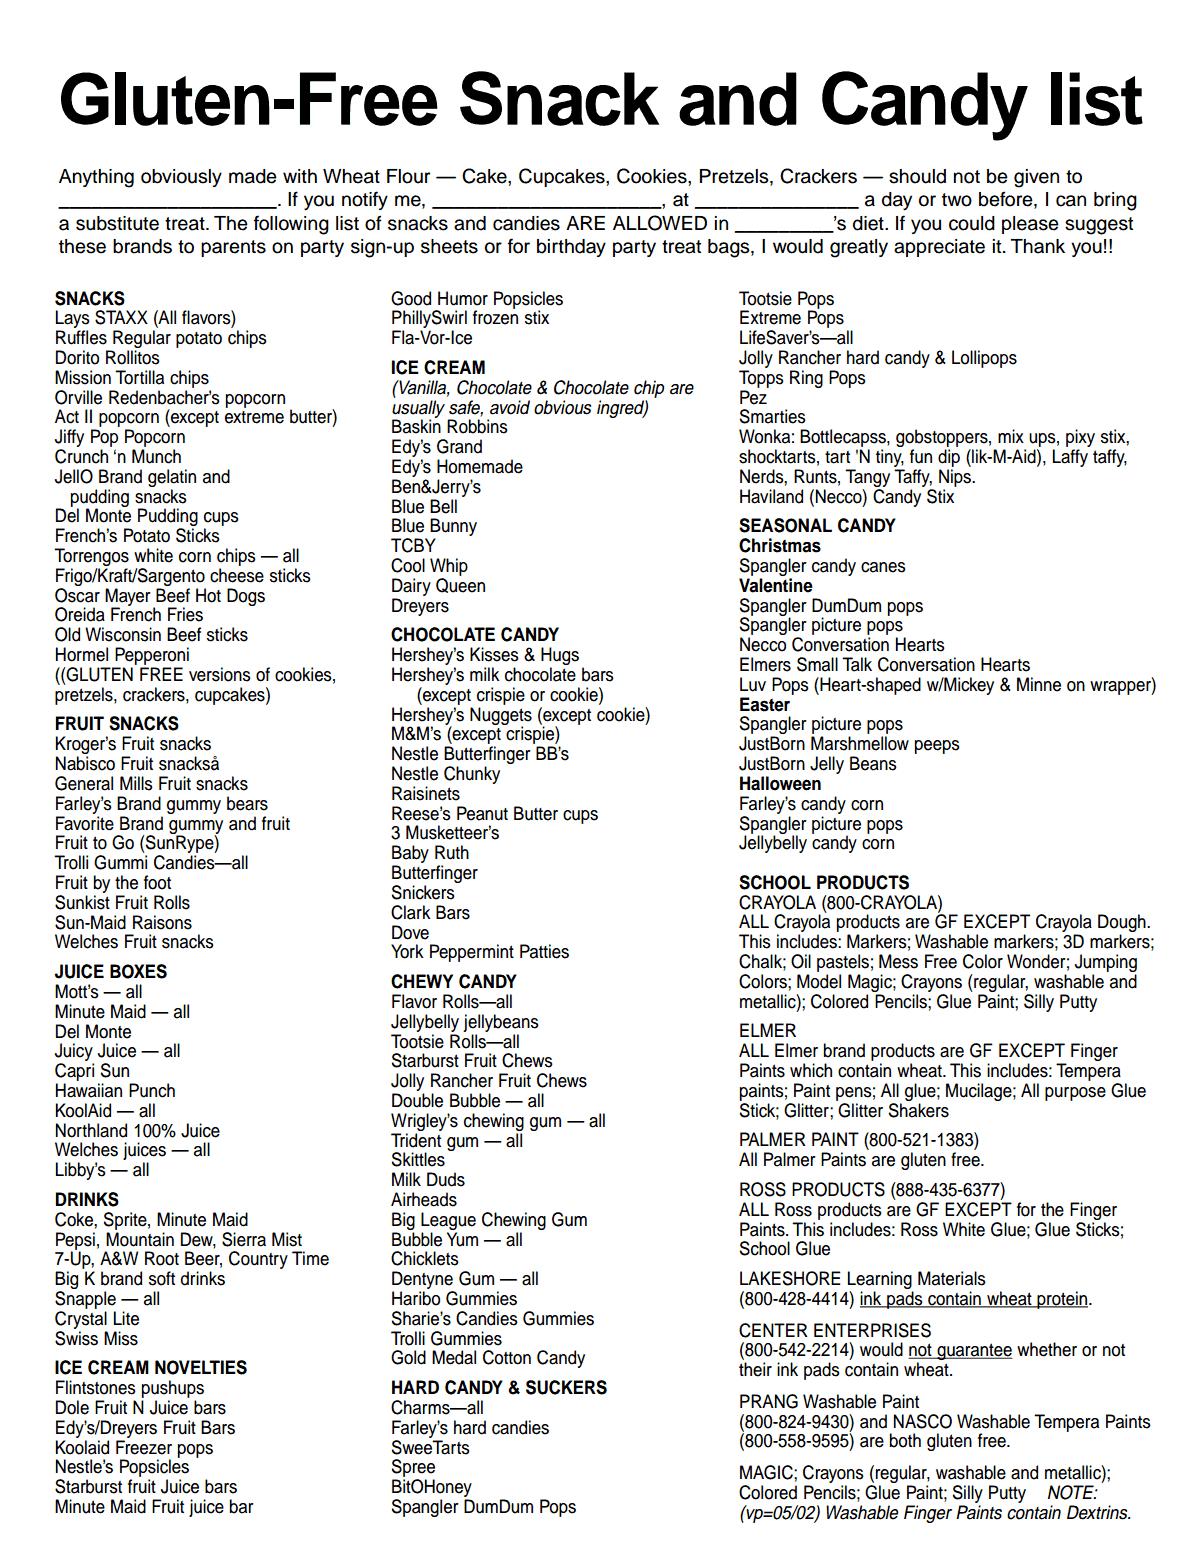 Gluten Free List From Stonebriar Community Church4